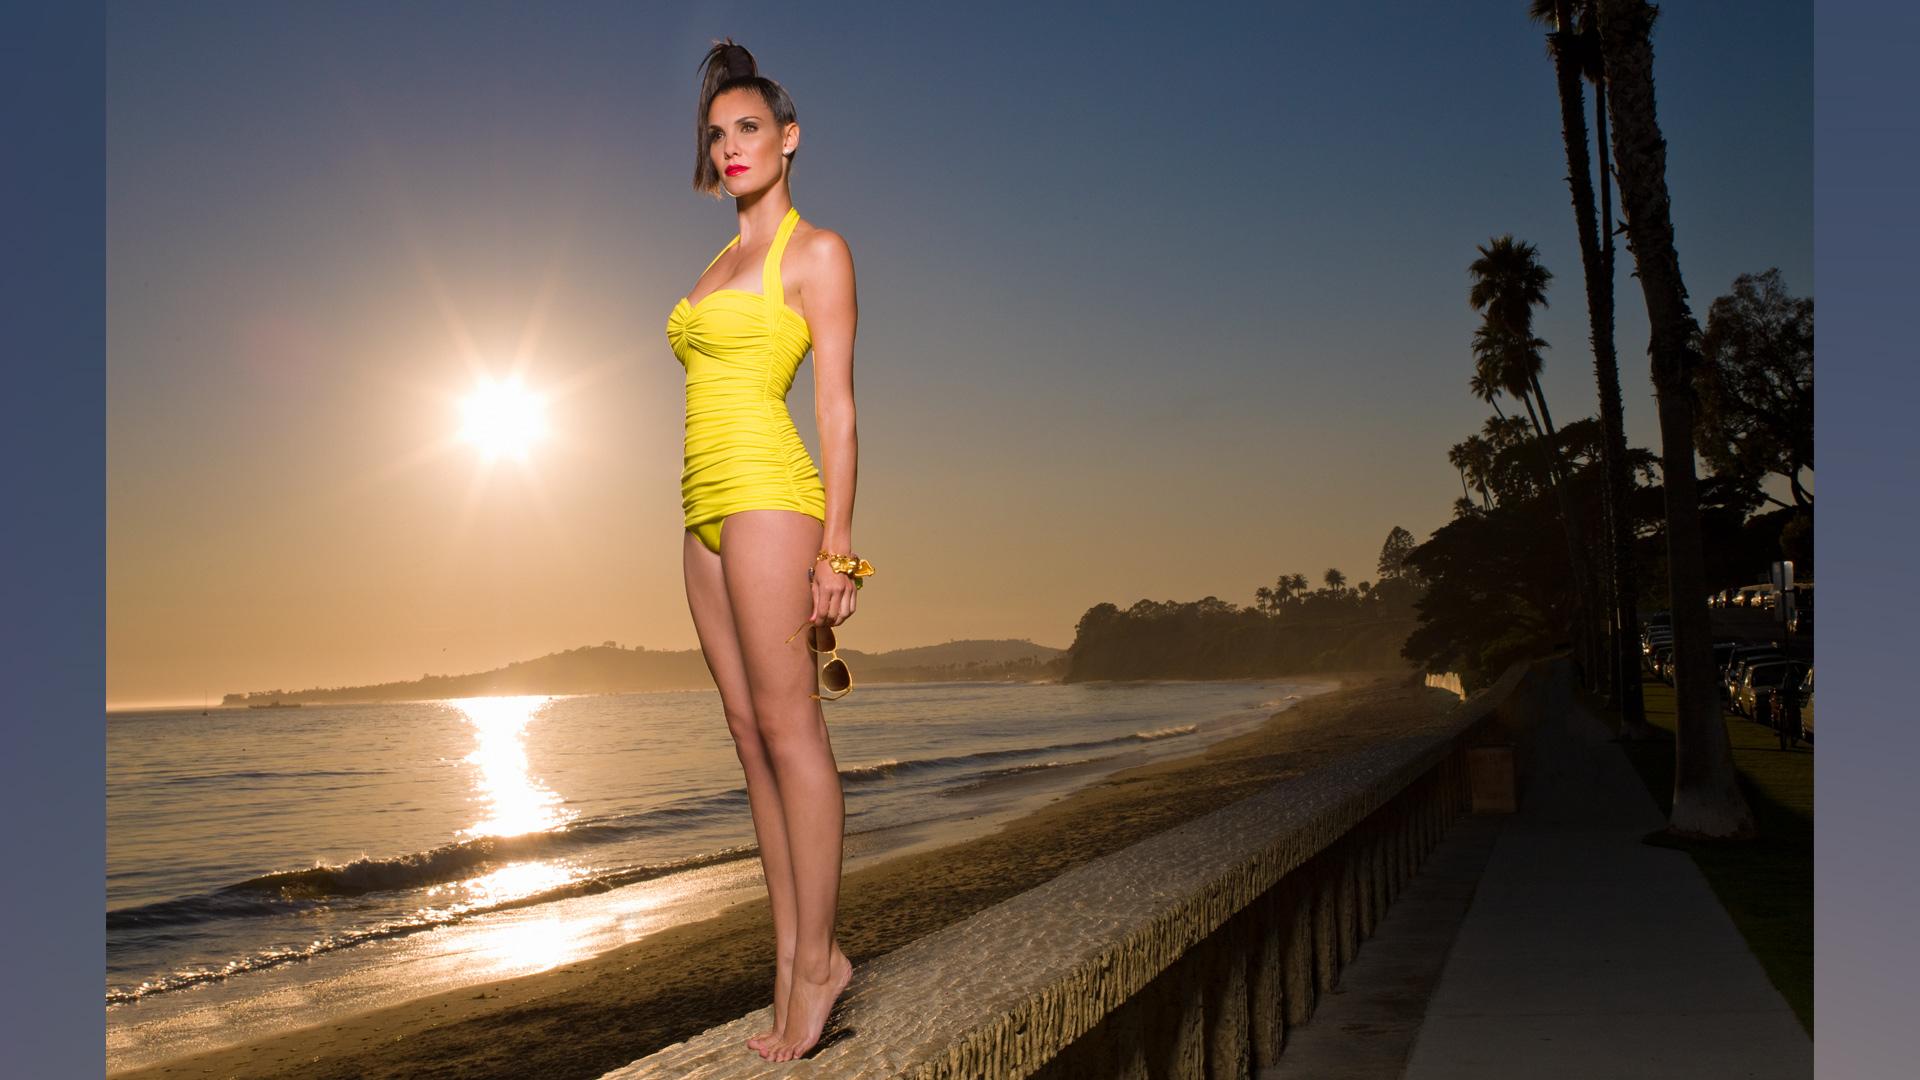 Daniela Ruah delivering that California dreamy